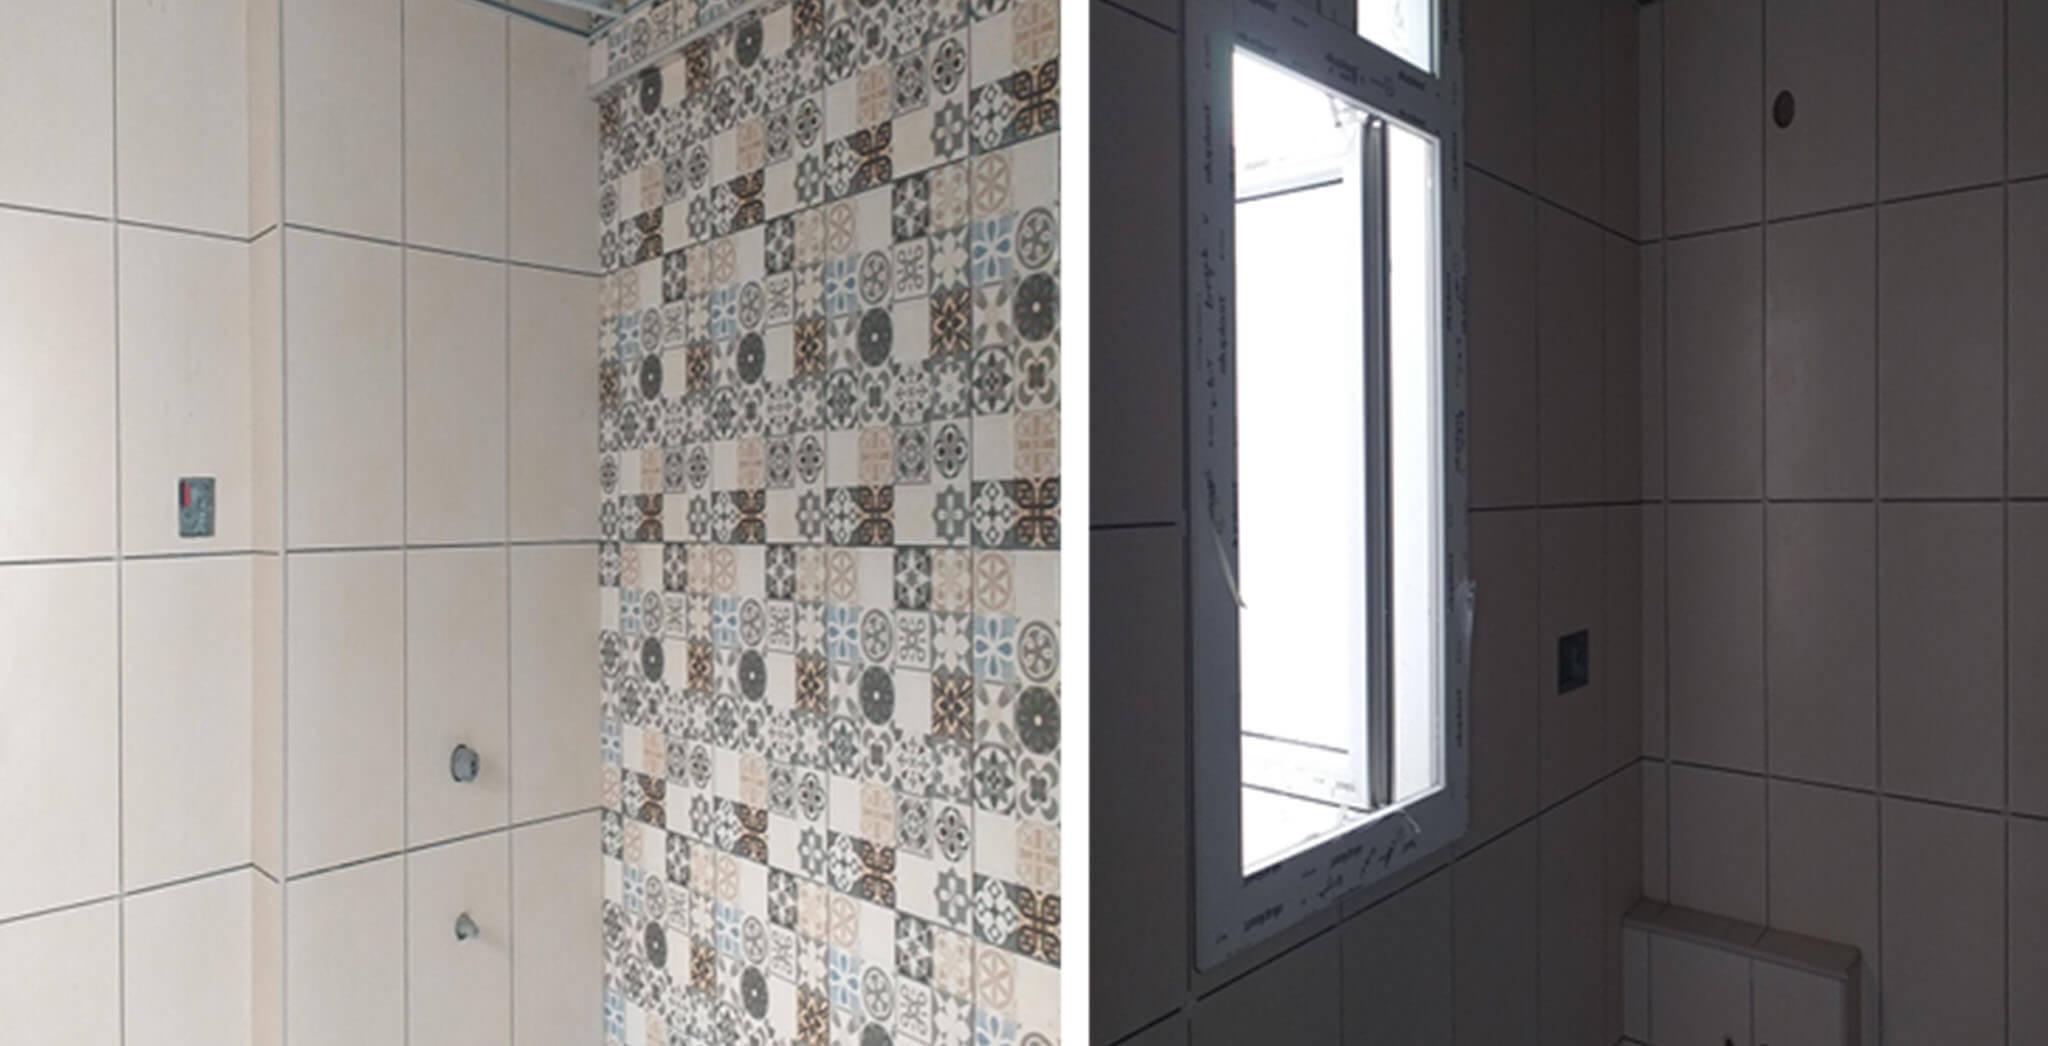 Jun 2021 - Block G: Toilet dado work-in-progress